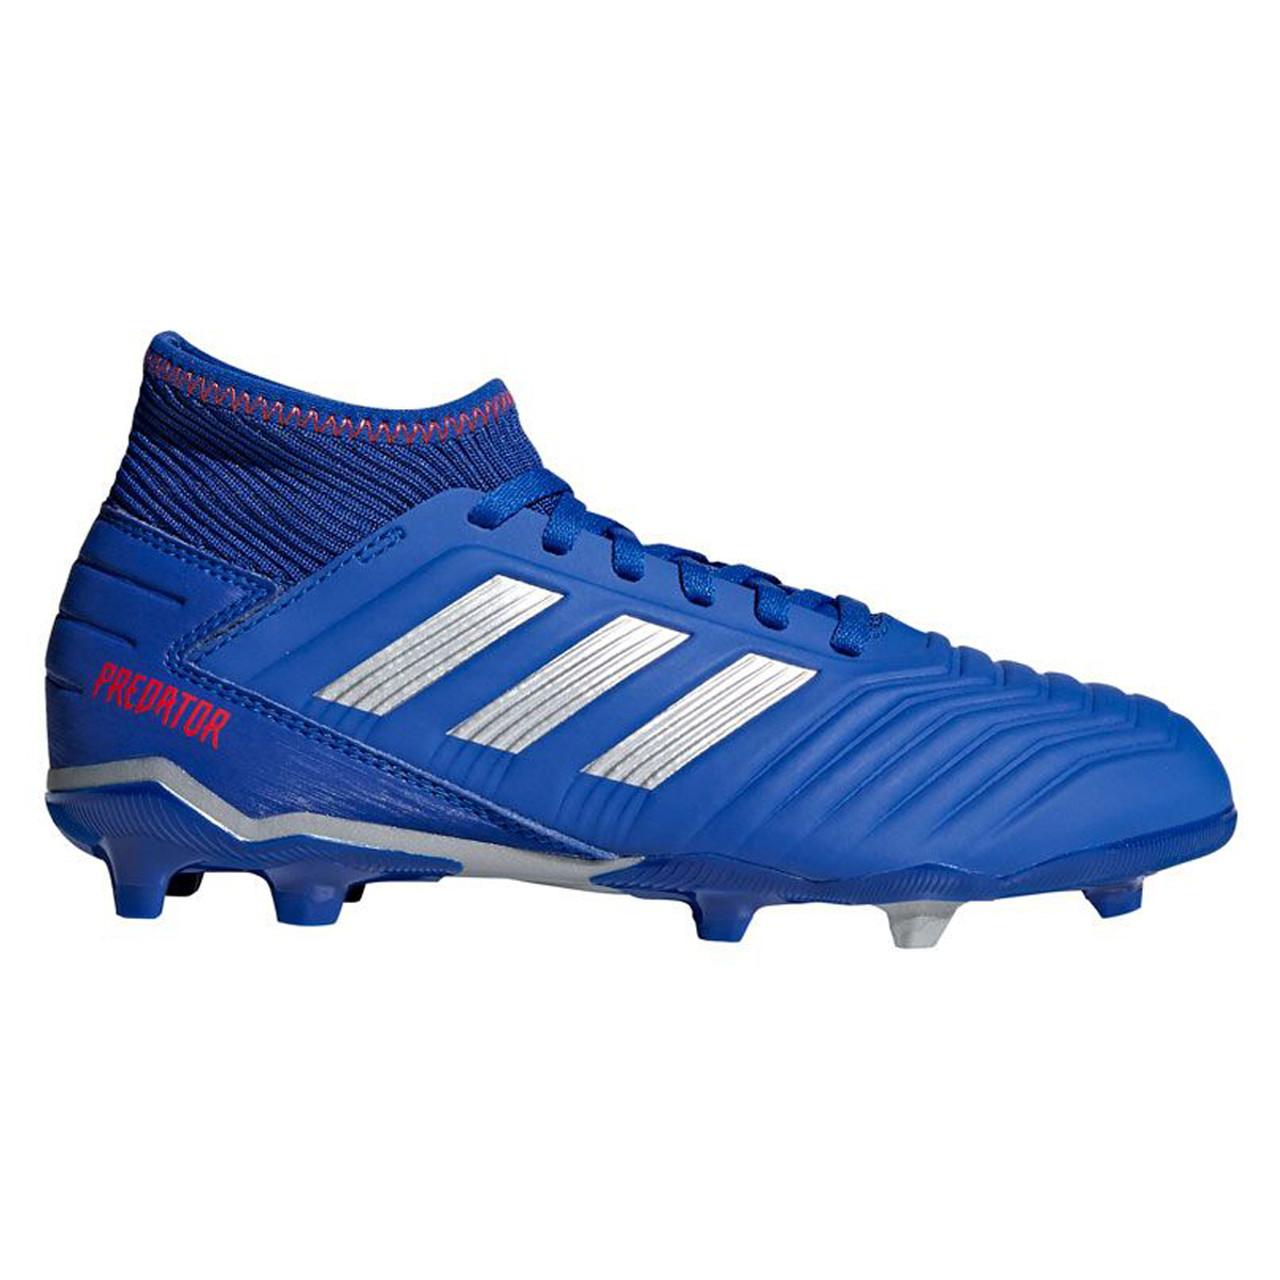 Adidas Predator 19.3 FG Junior Soccer Cleats CM8533 - Blue, Silver